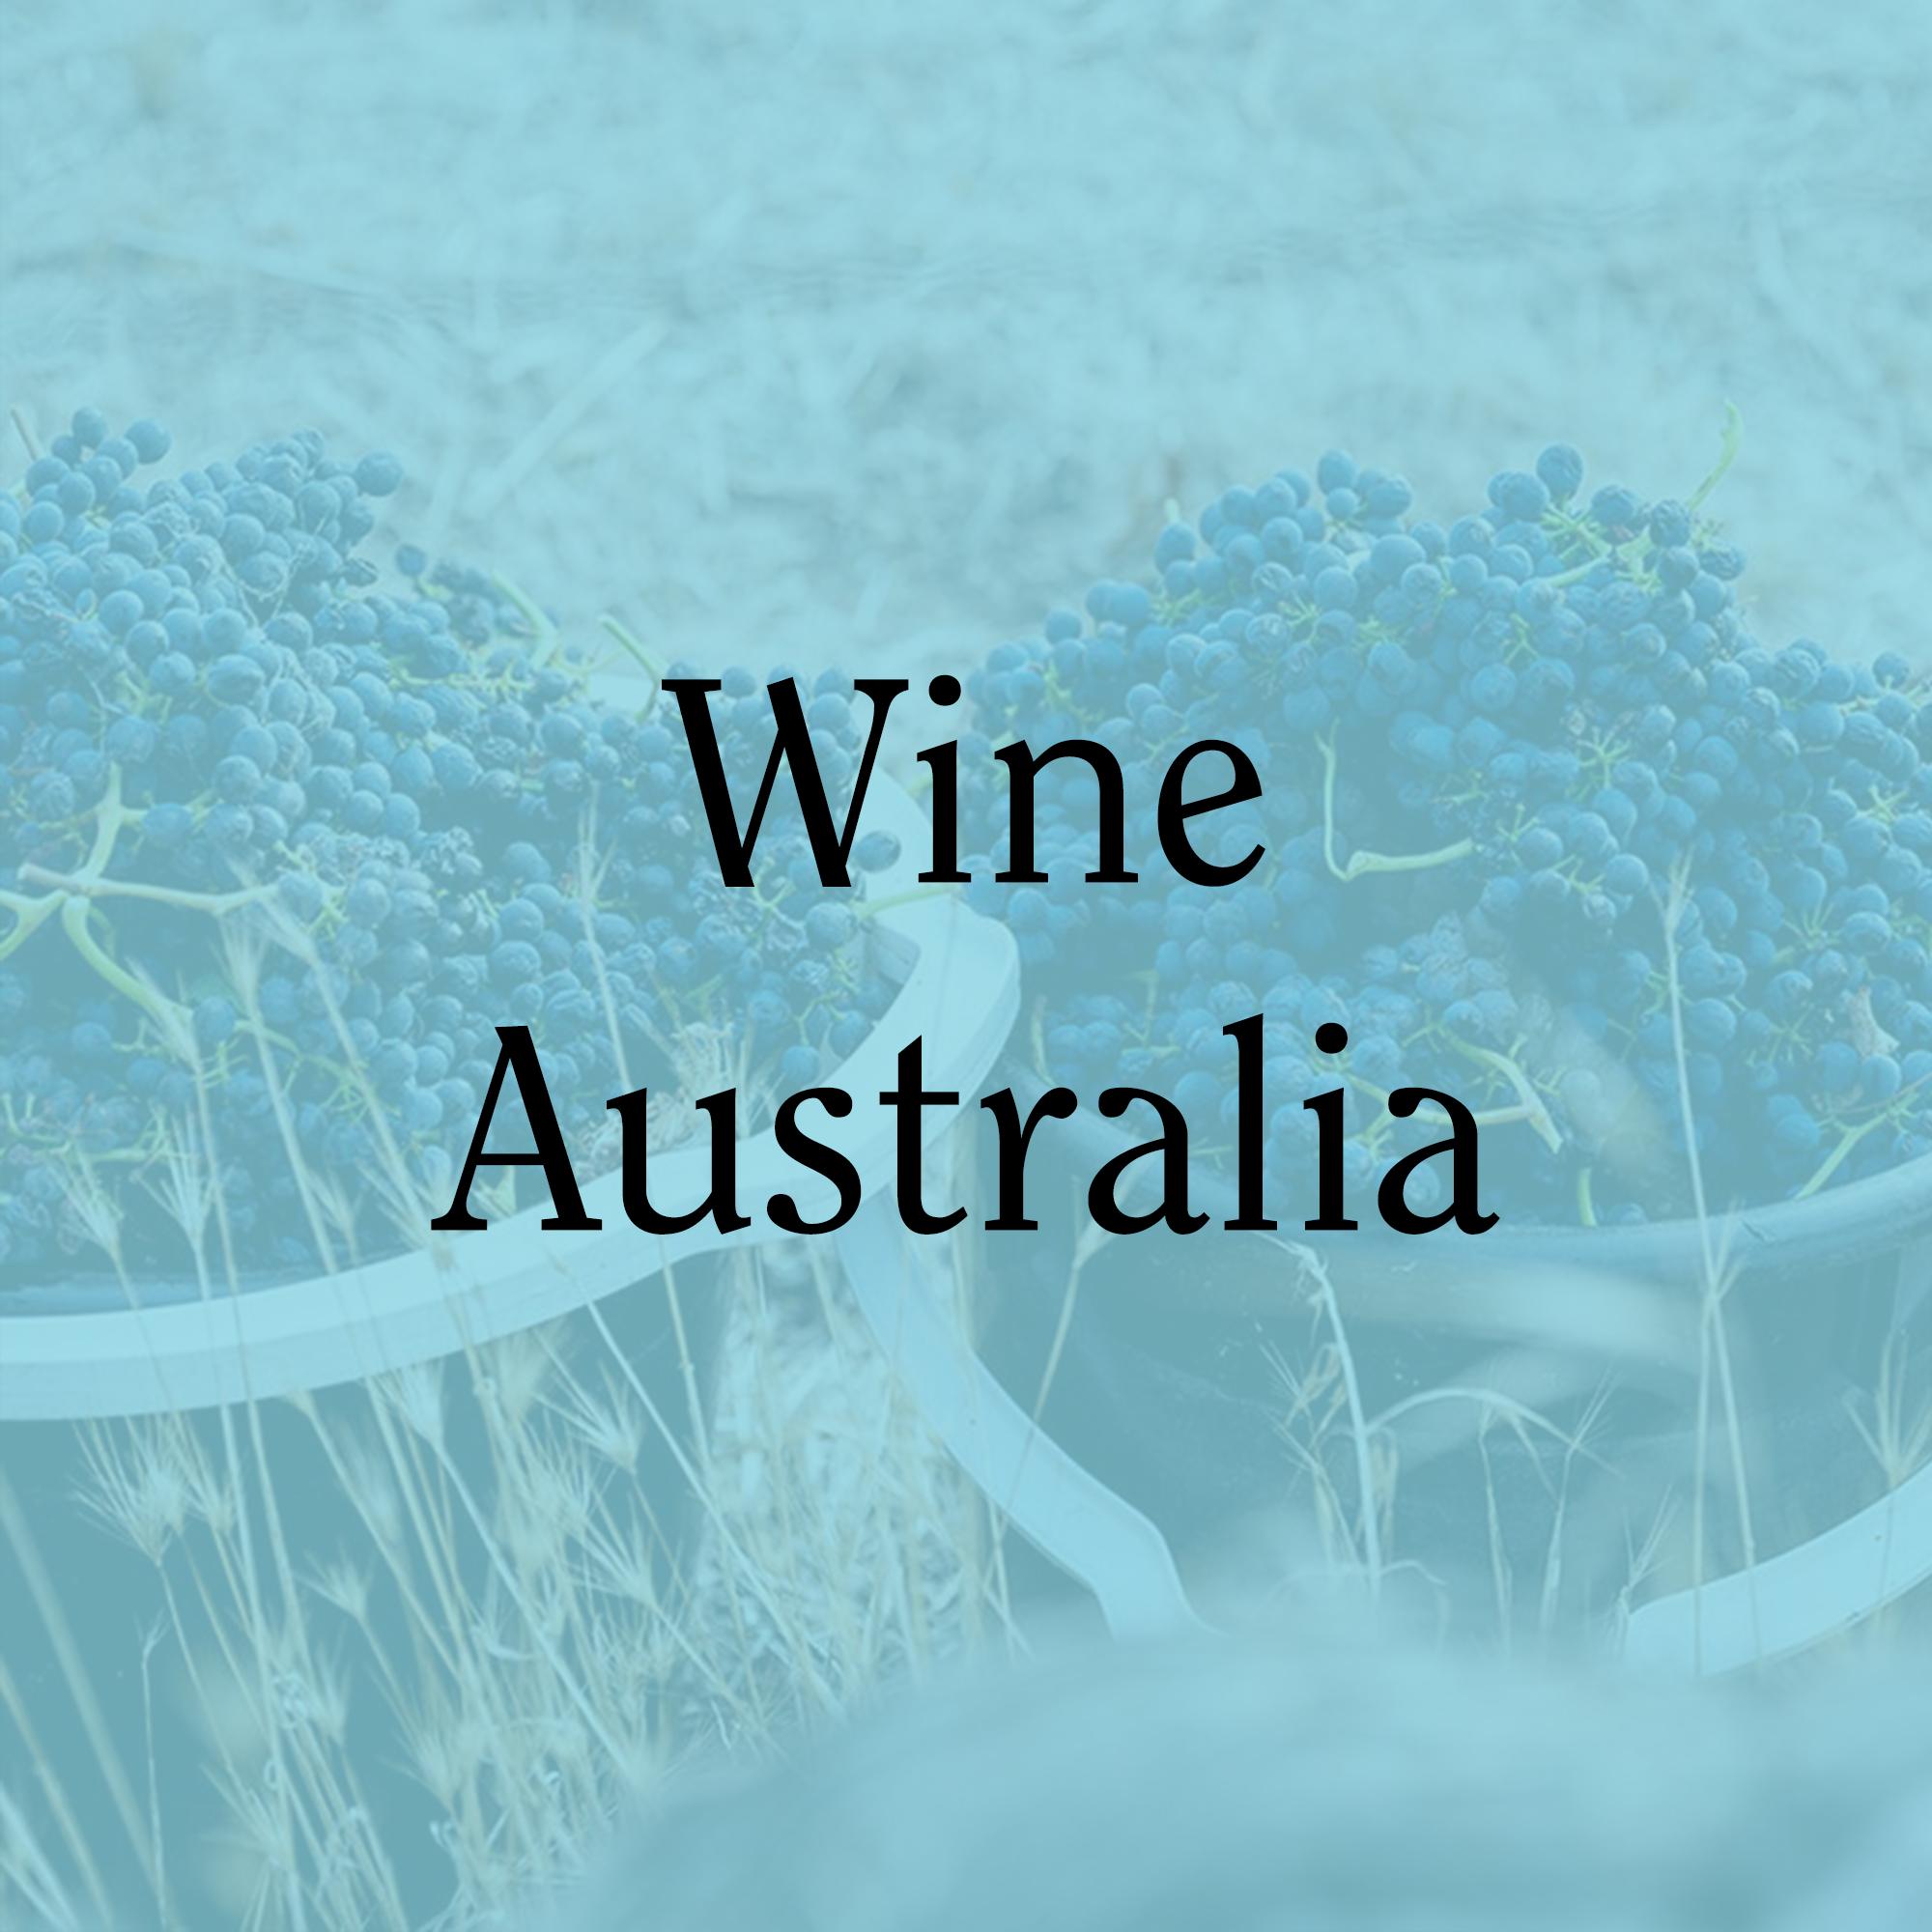 Wine Australia.png